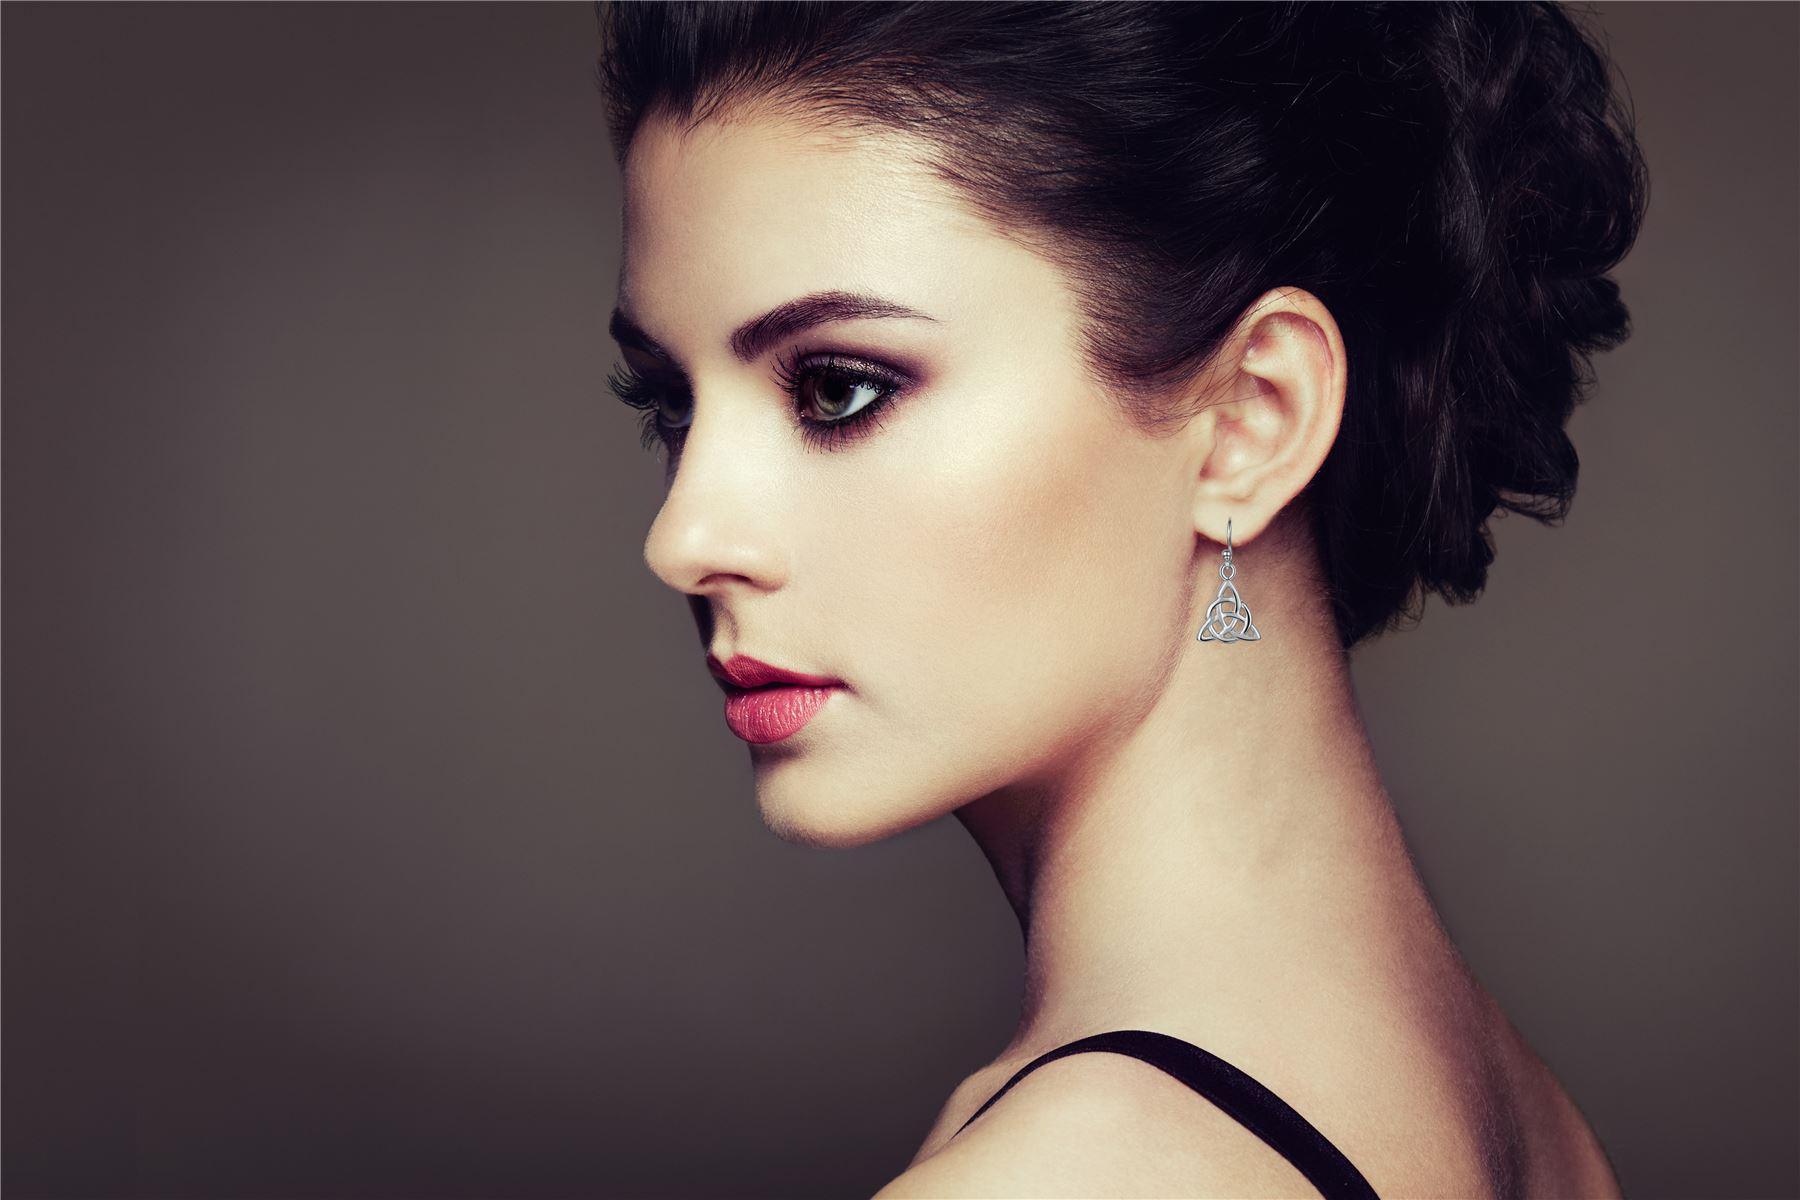 Amberta-925-Sterling-Silver-Celtic-Knot-Earrings-for-Women-Irish-Design miniature 17